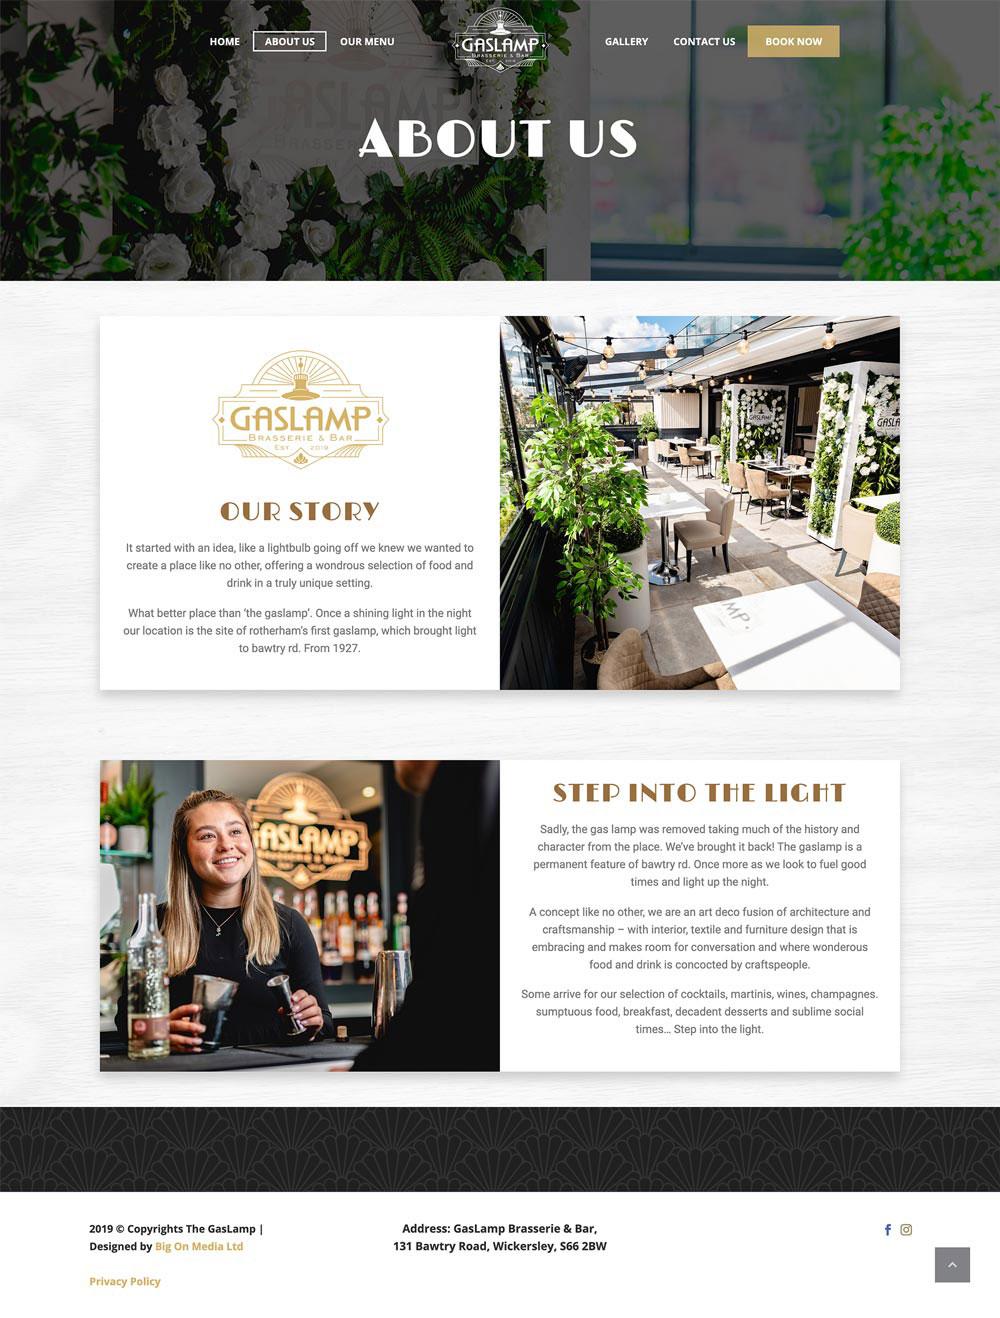 GasLamp Brasserie Bar Wickersley Idea Design Creative Design Studio Photography Rotherham Sheffield About After